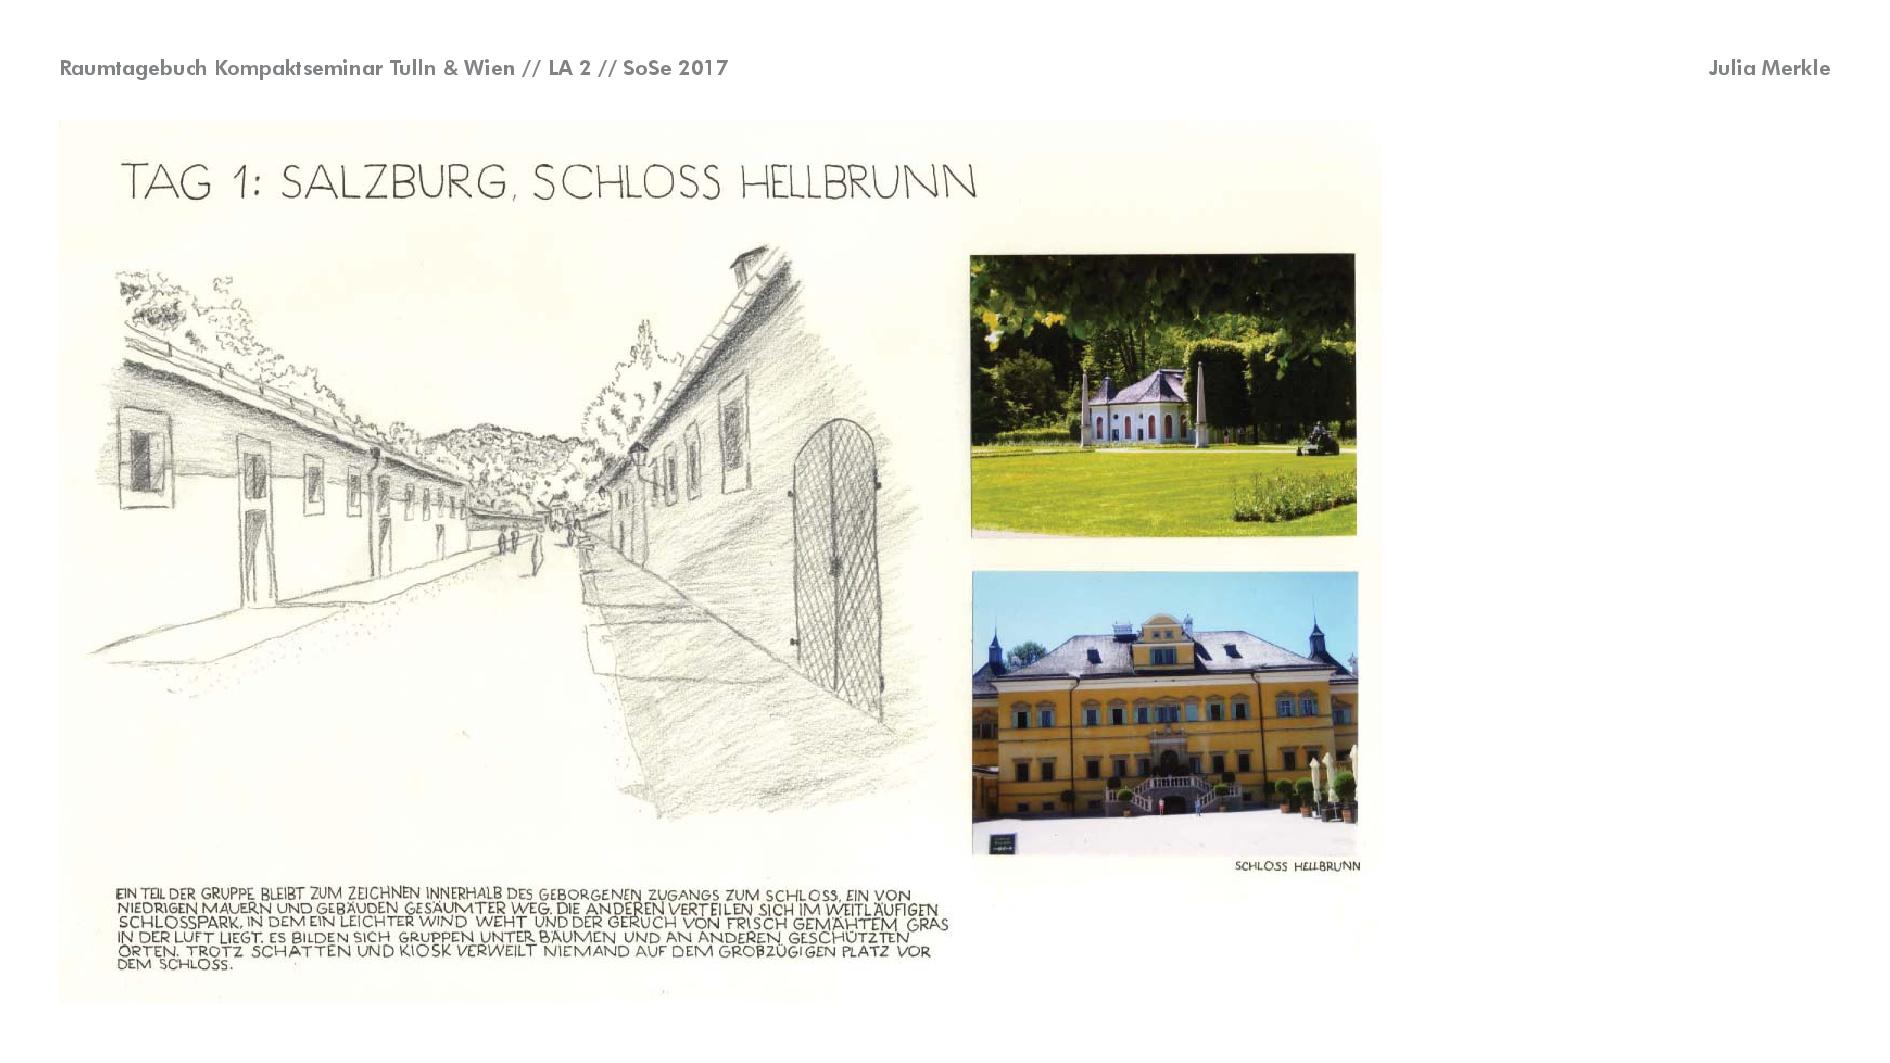 NEU Screen Raumtagebuch Tulln Wien SoSe 17 022